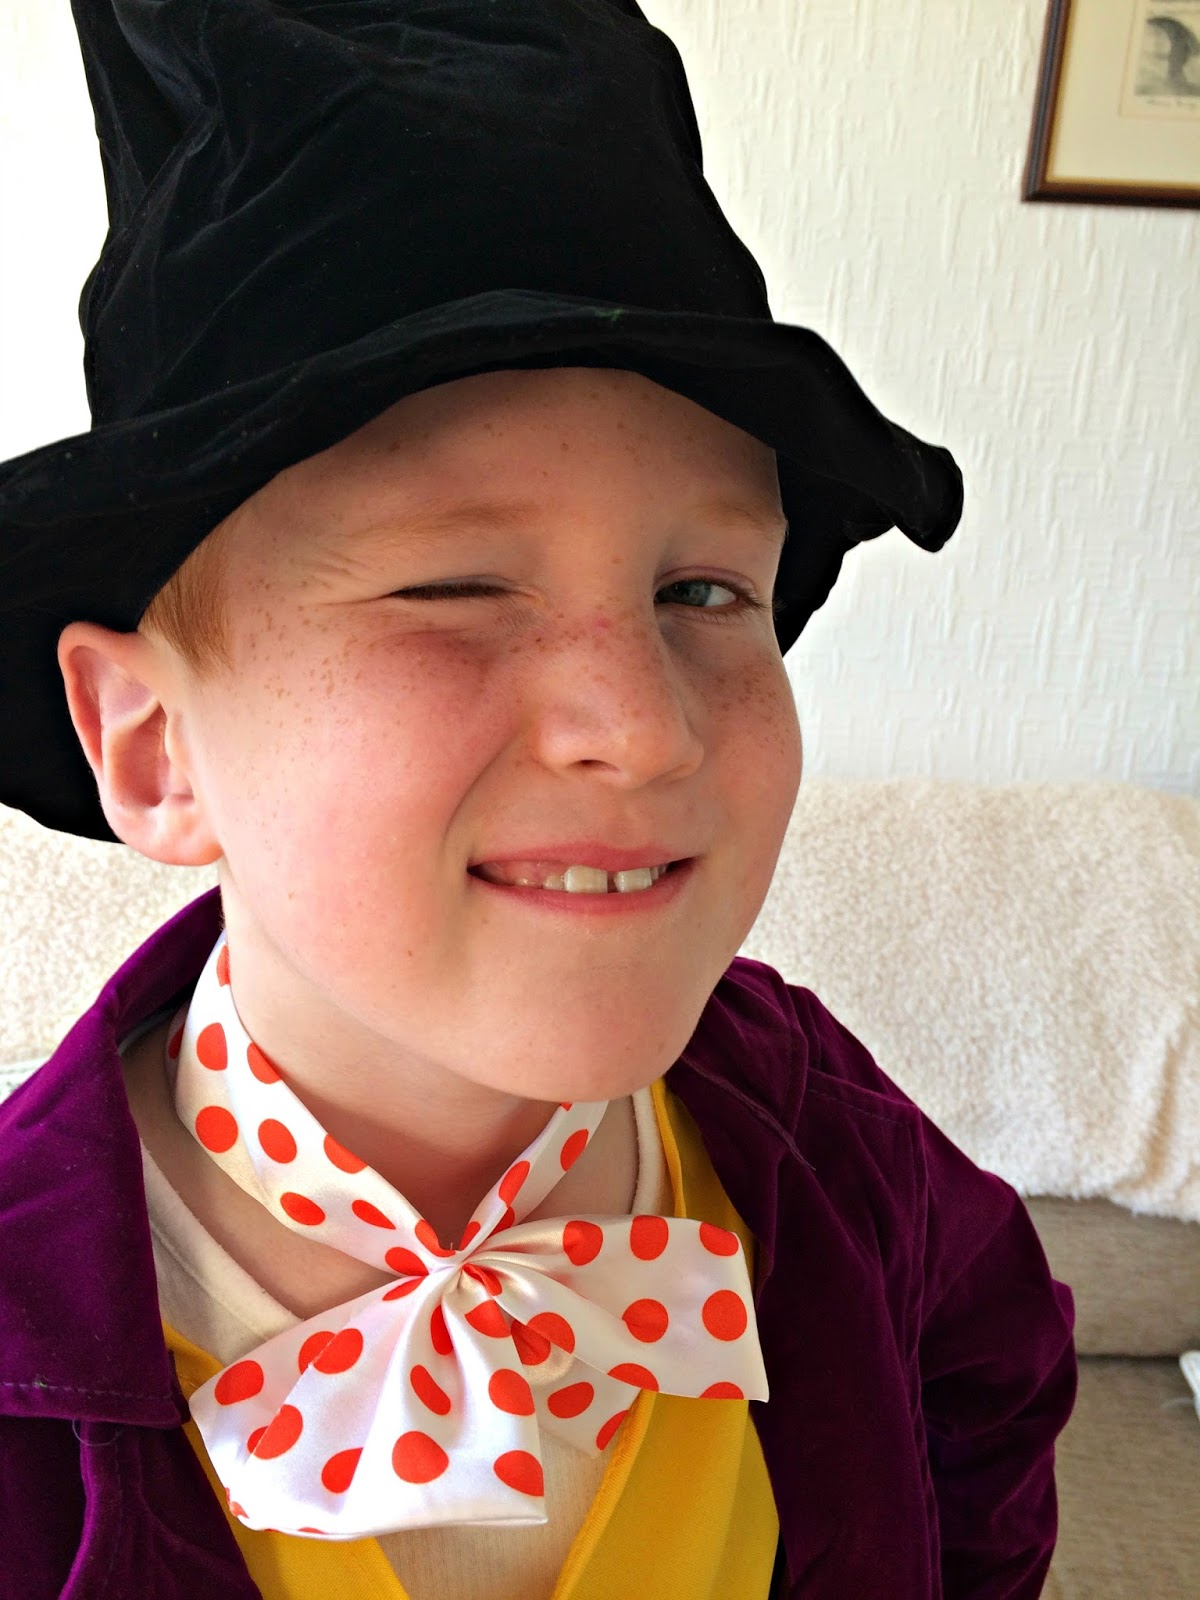 Ieuan dressed as Willy Wonka